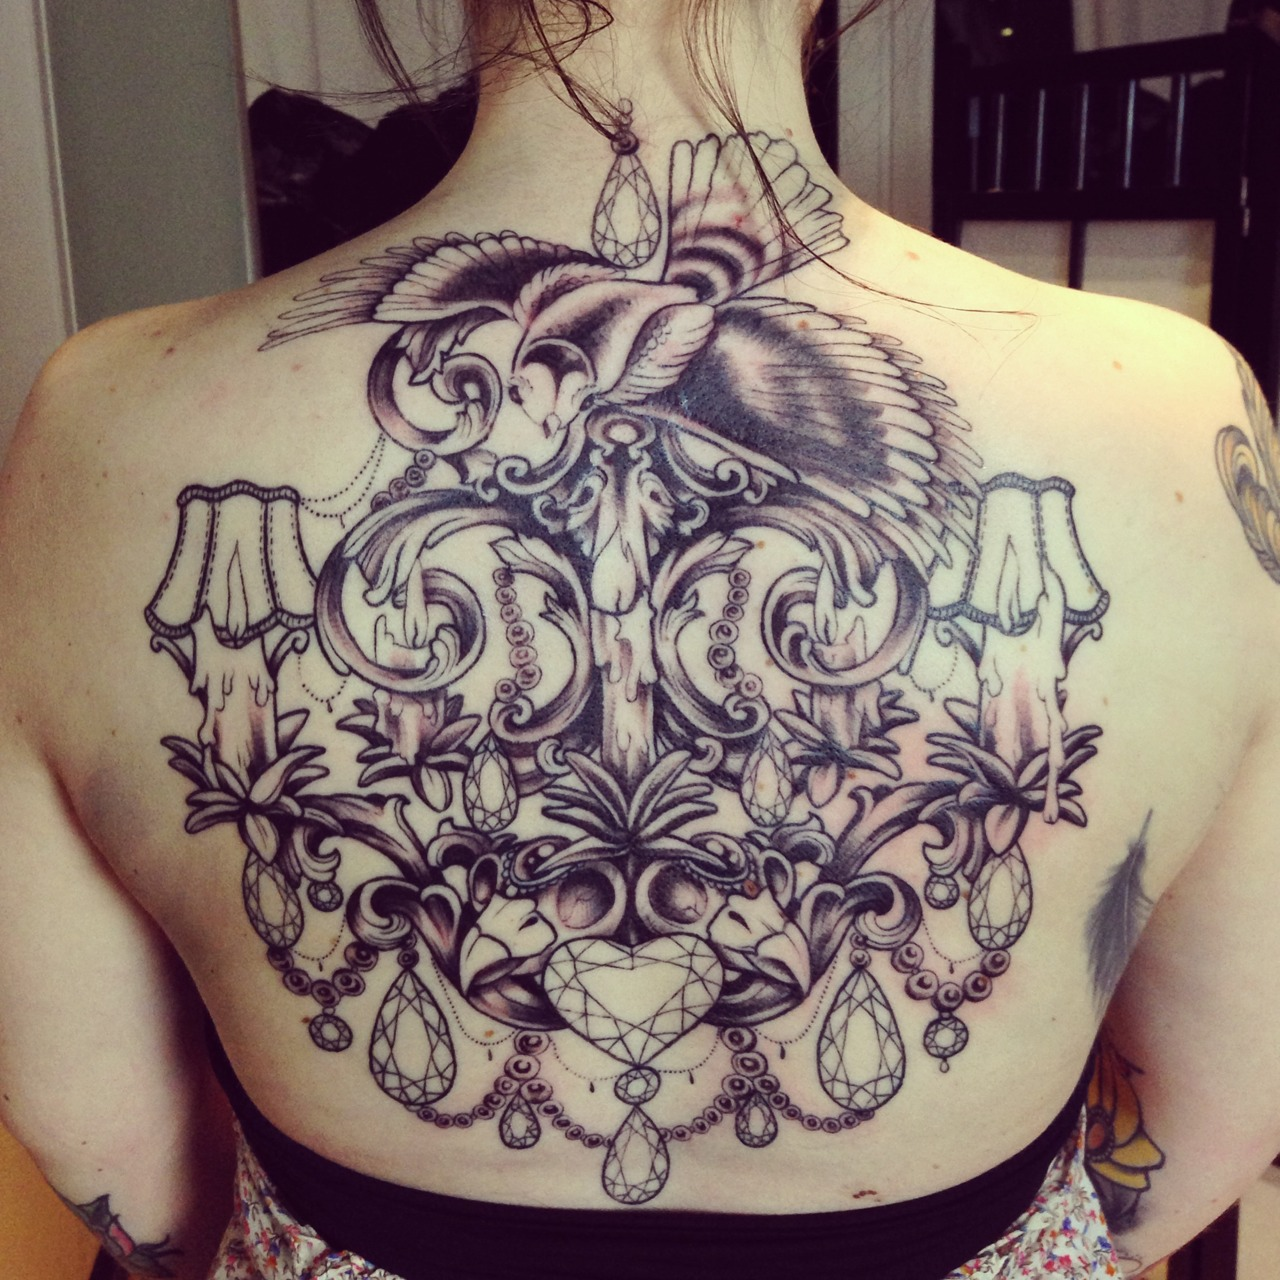 Tattooz Designs Back Tattoos: Incredible-chandelier-back-tattoo.jpg